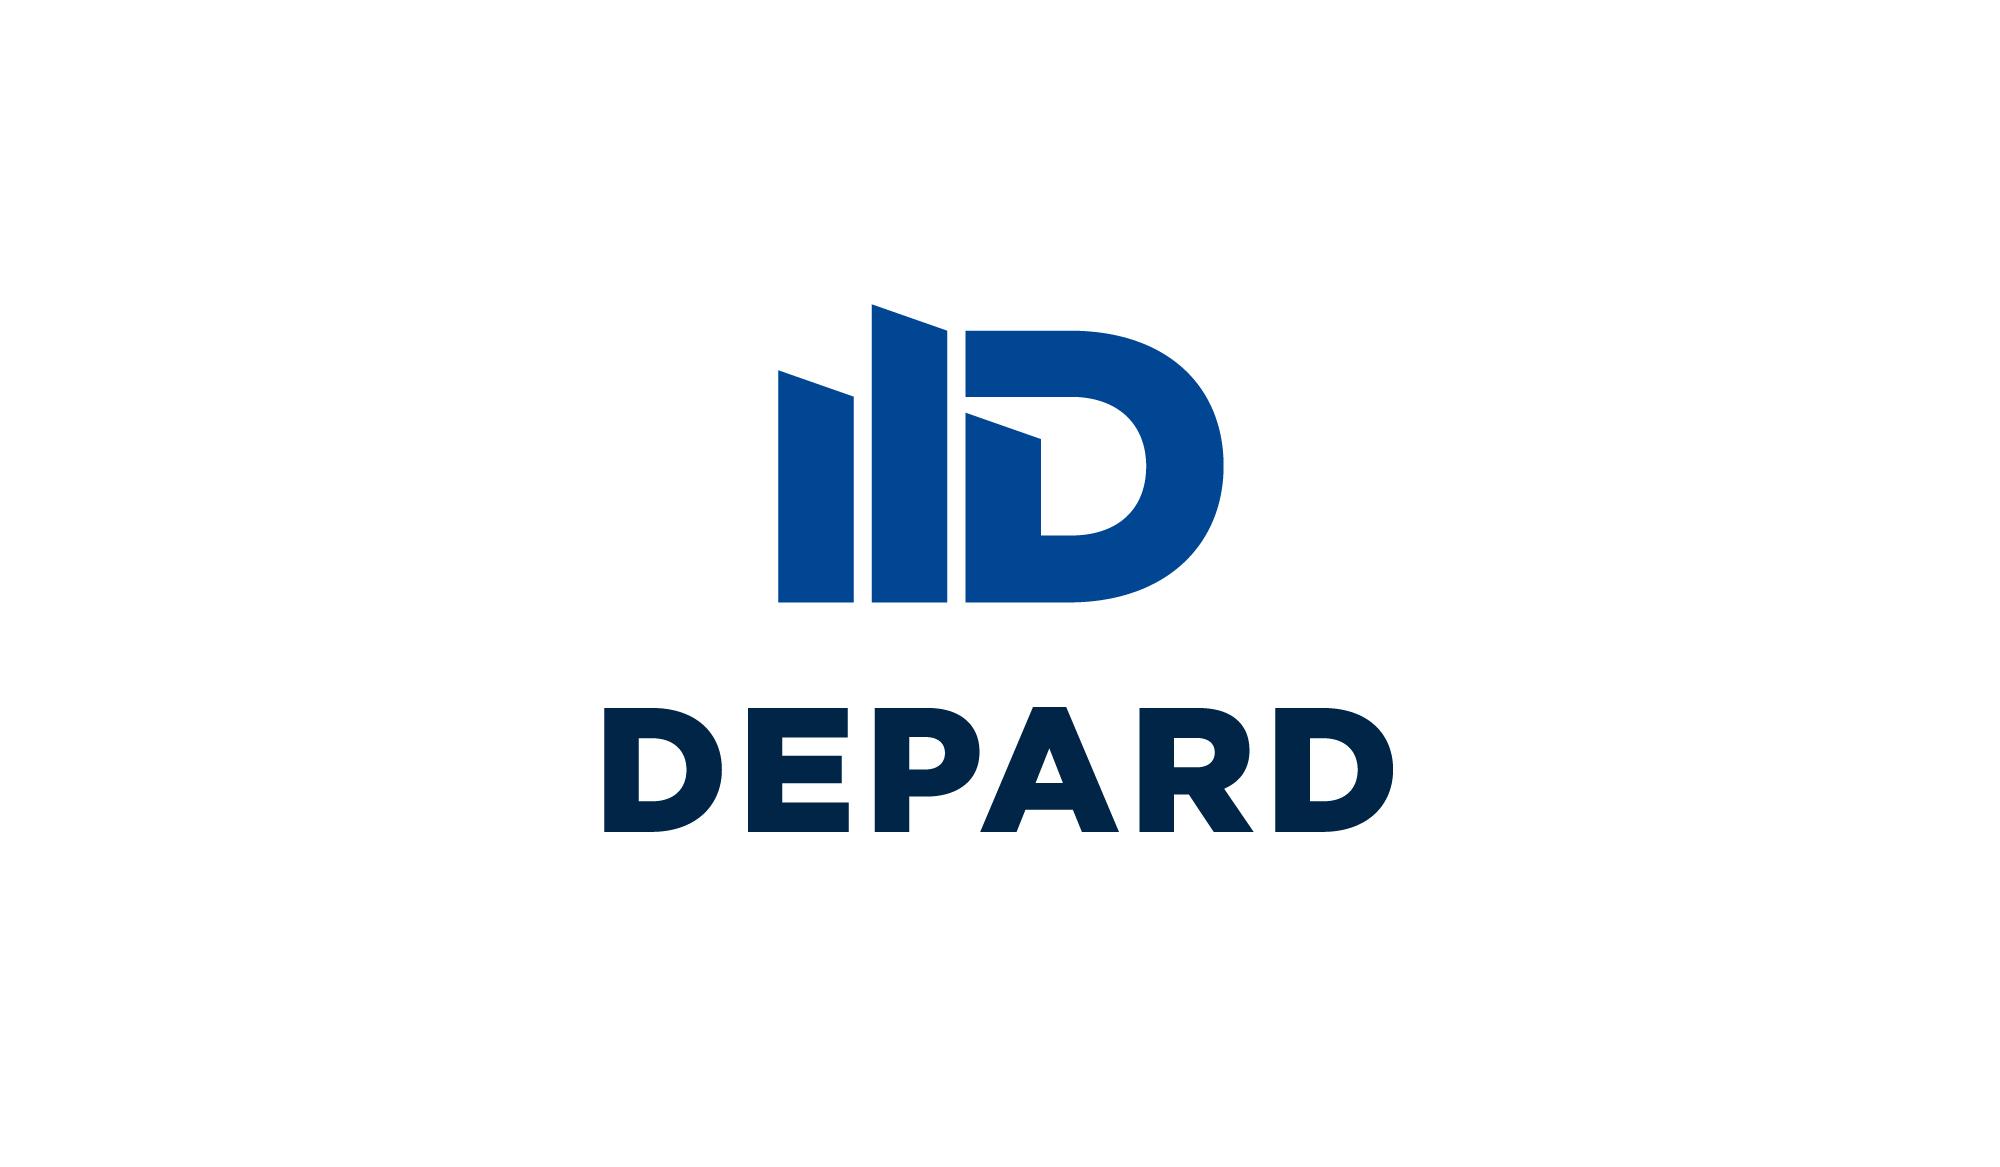 Логотип для компании (услуги недвижимость) фото f_0365932b886a617a.jpg